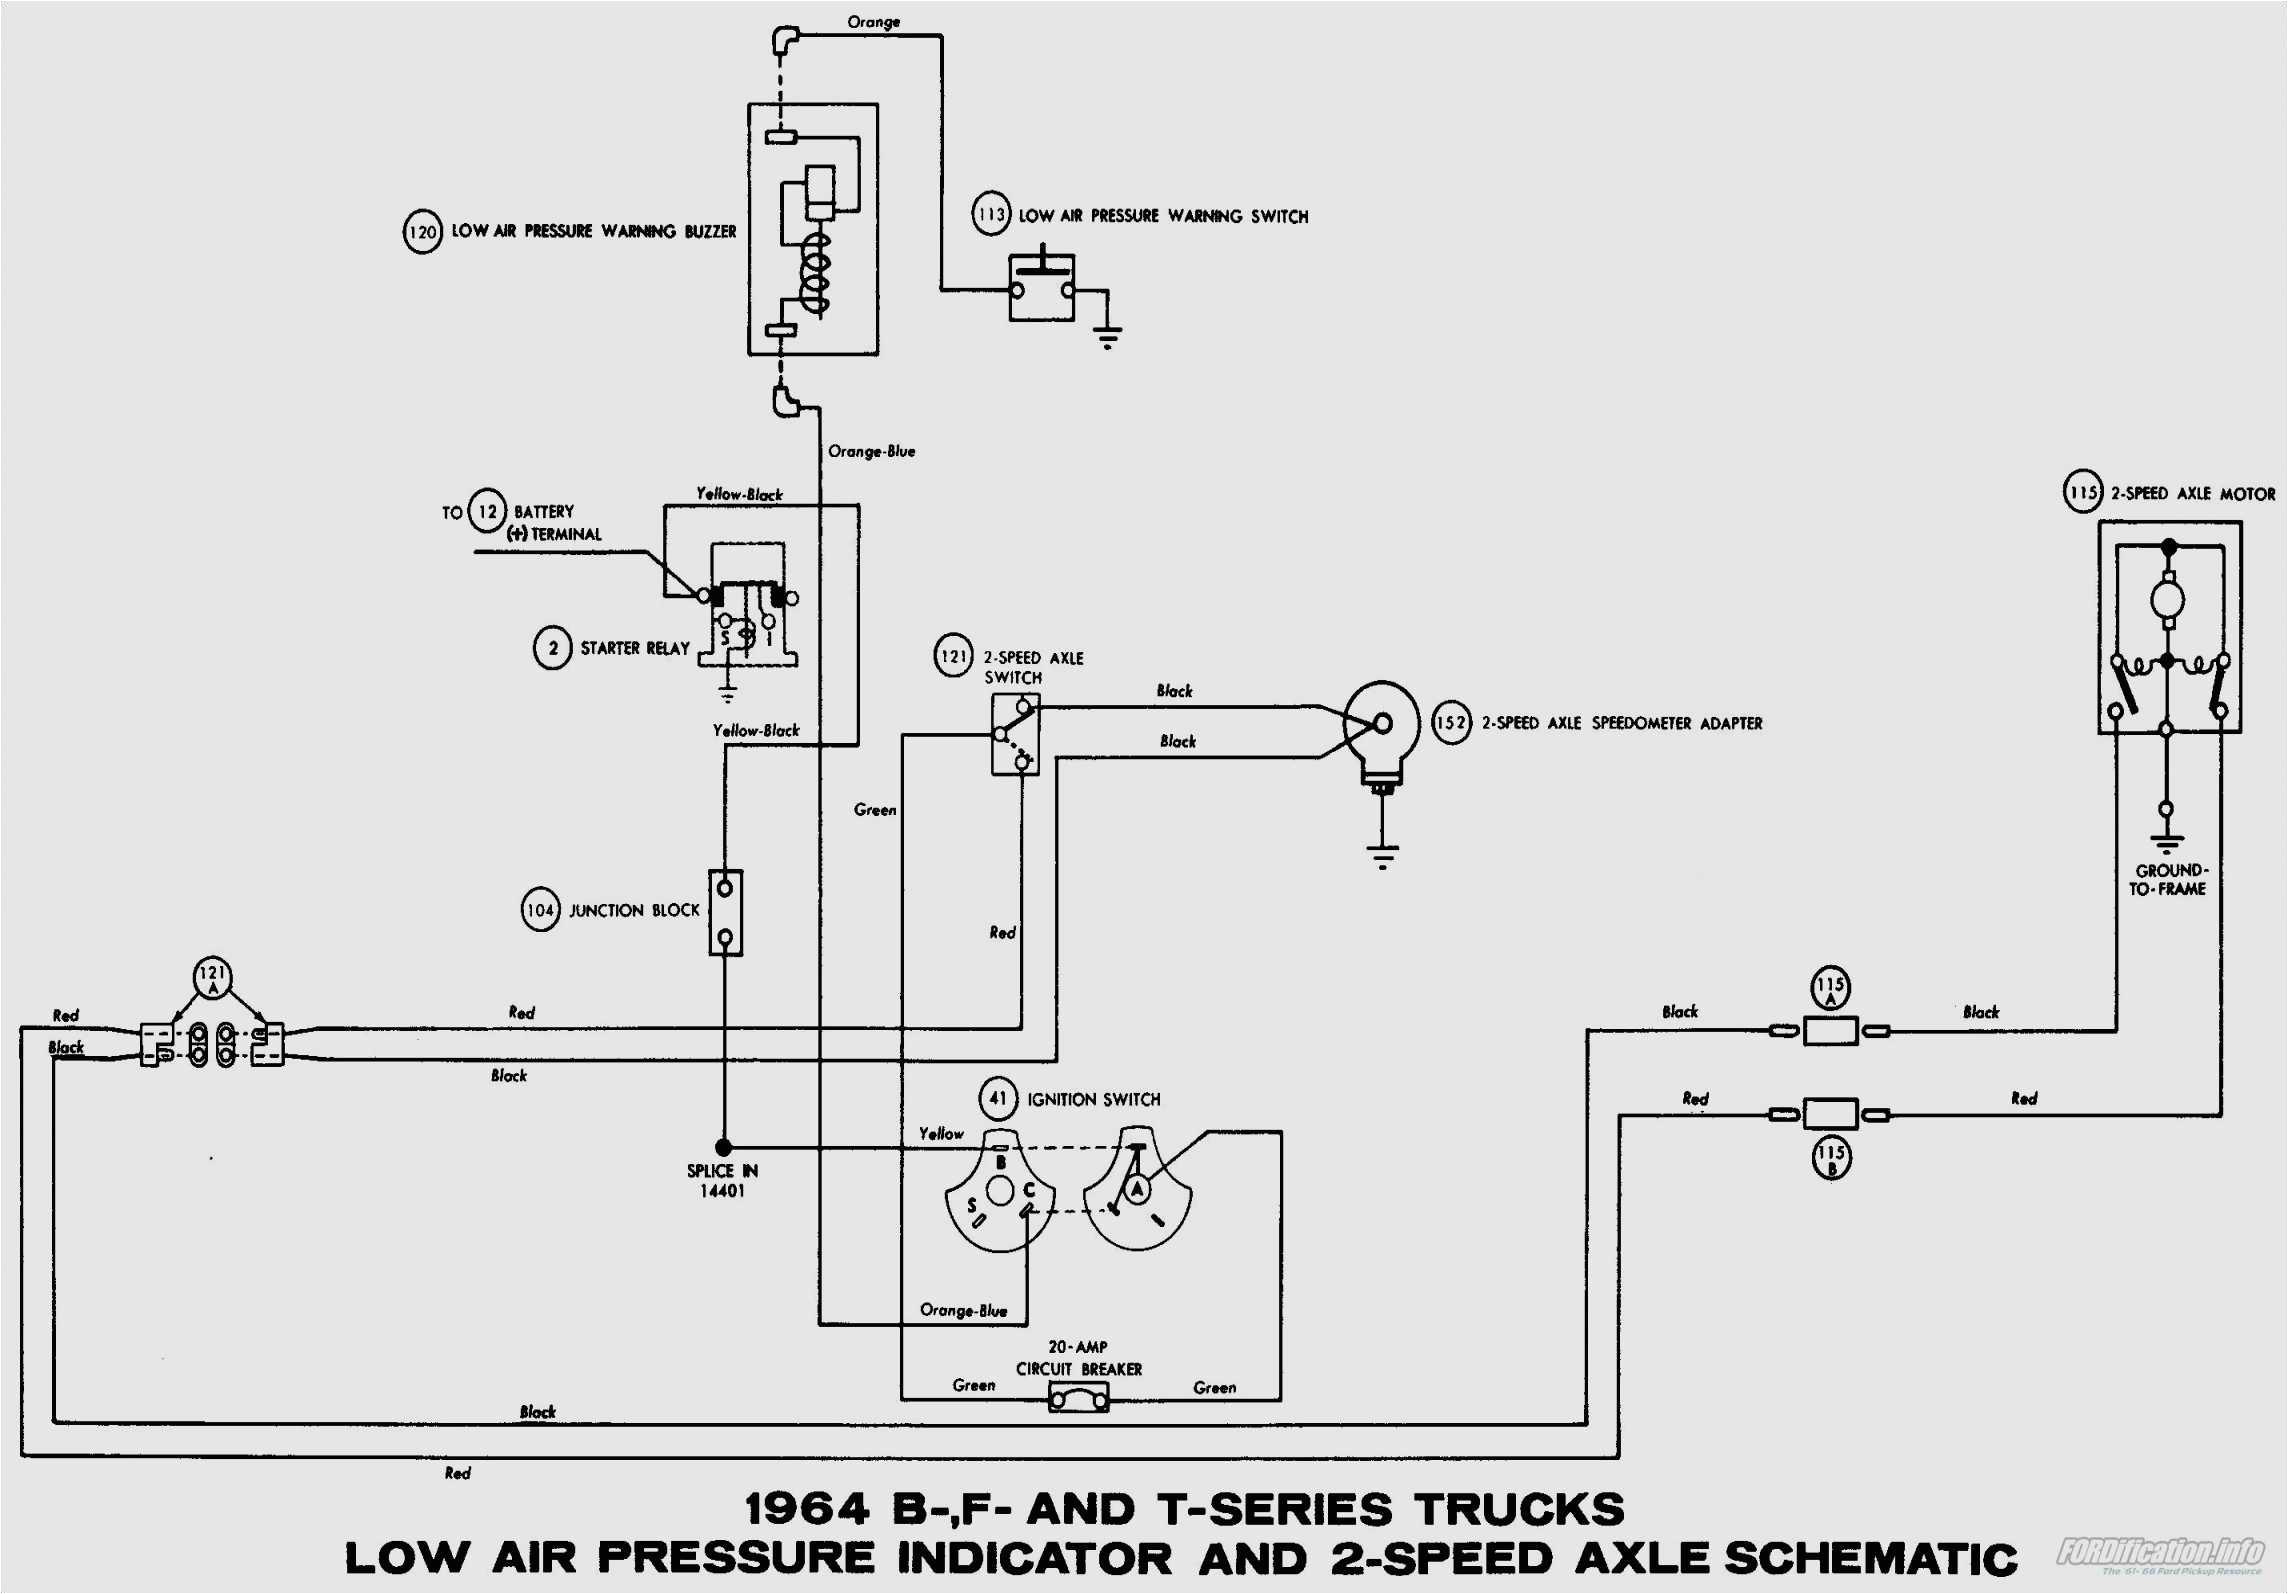 hermetic compressor wiring diagram eaton part start winding diagram trusted wiring diagrams e280a2 of hermetic compressor wiring diagram jpg